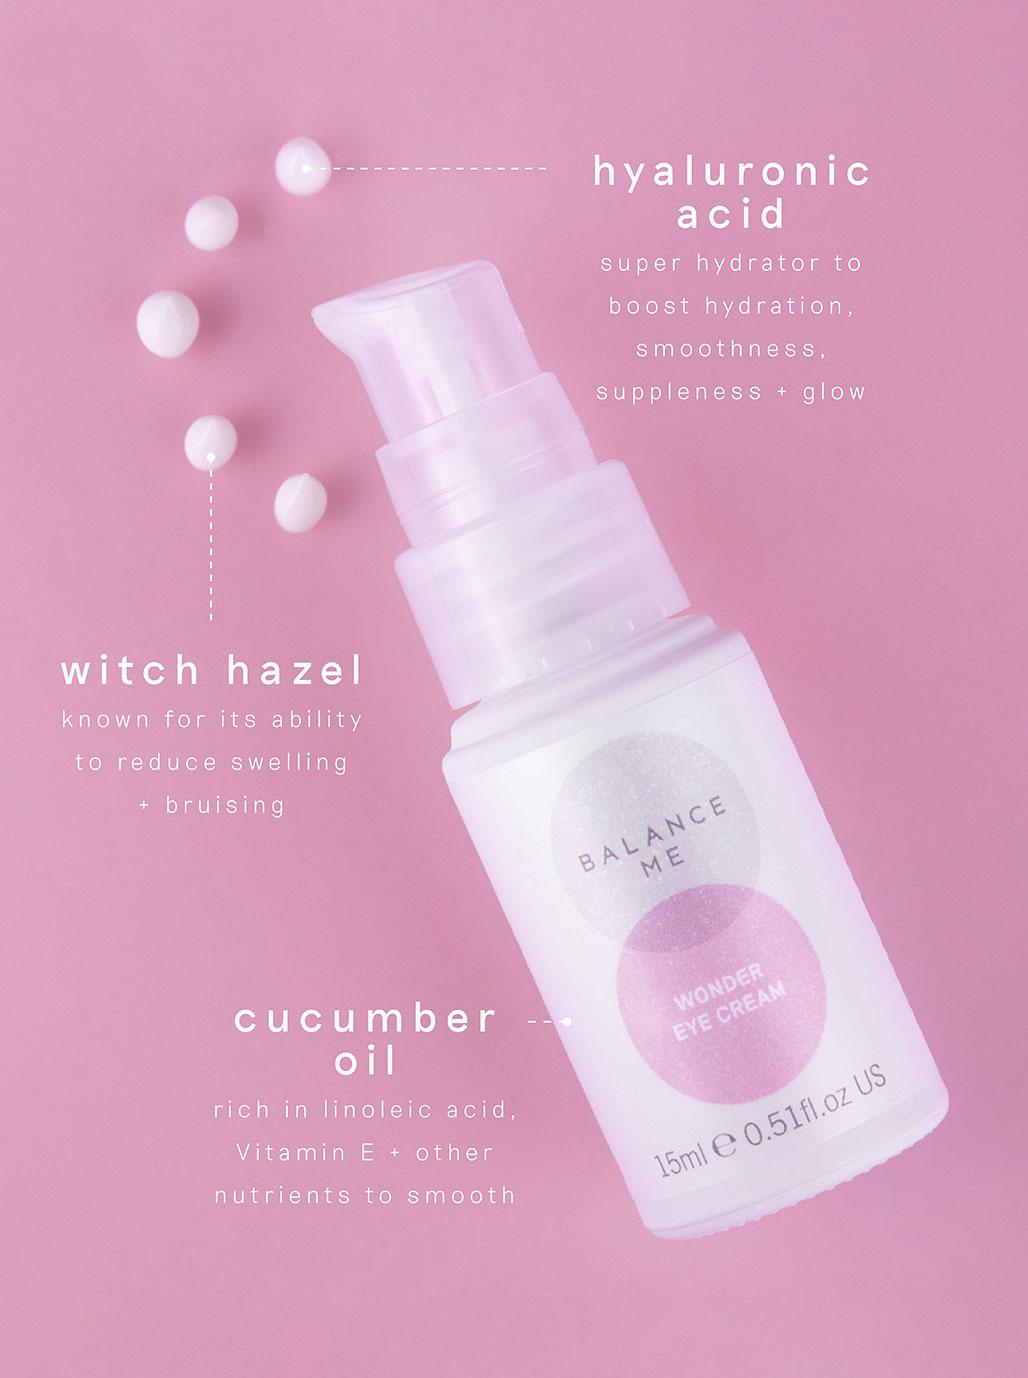 Balance Me Wonder Eye Cream active ingredients: Hyaluronic Acid, Witch Hazel and Cucumber Oil.